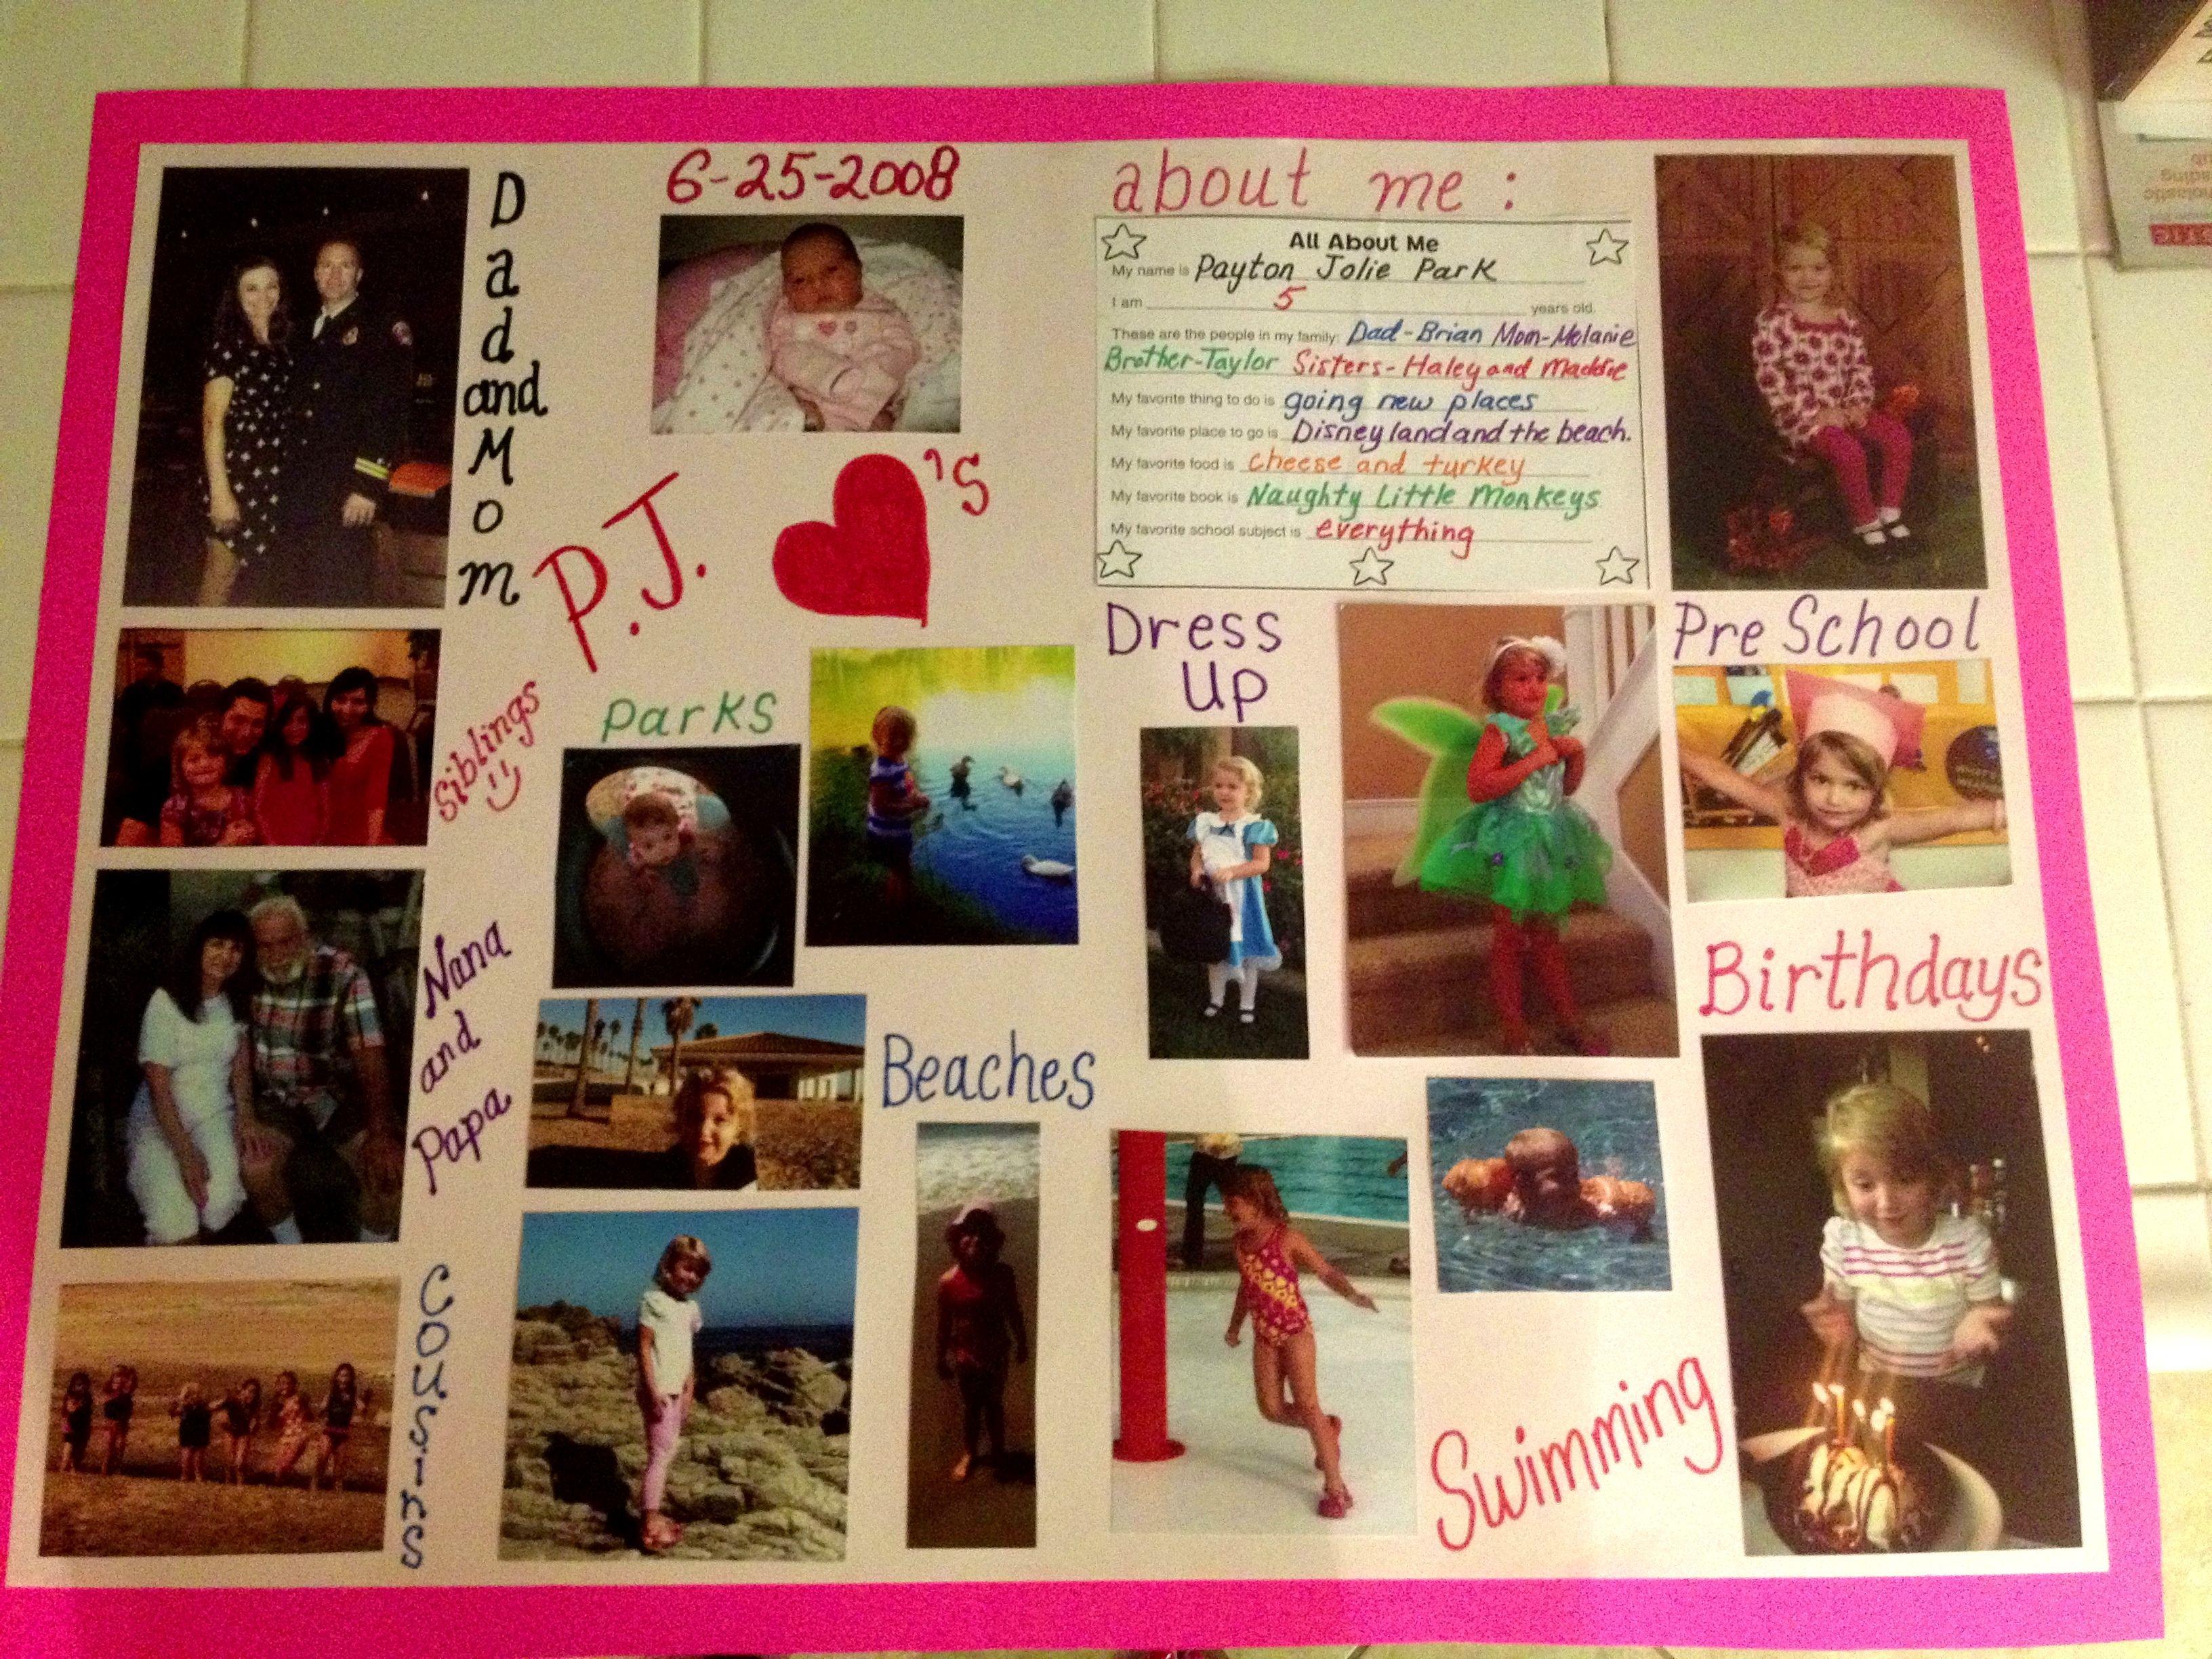 87b94b7289cff5c6ba2b99c73a74ab6a - All About Me Poster Kindergarten